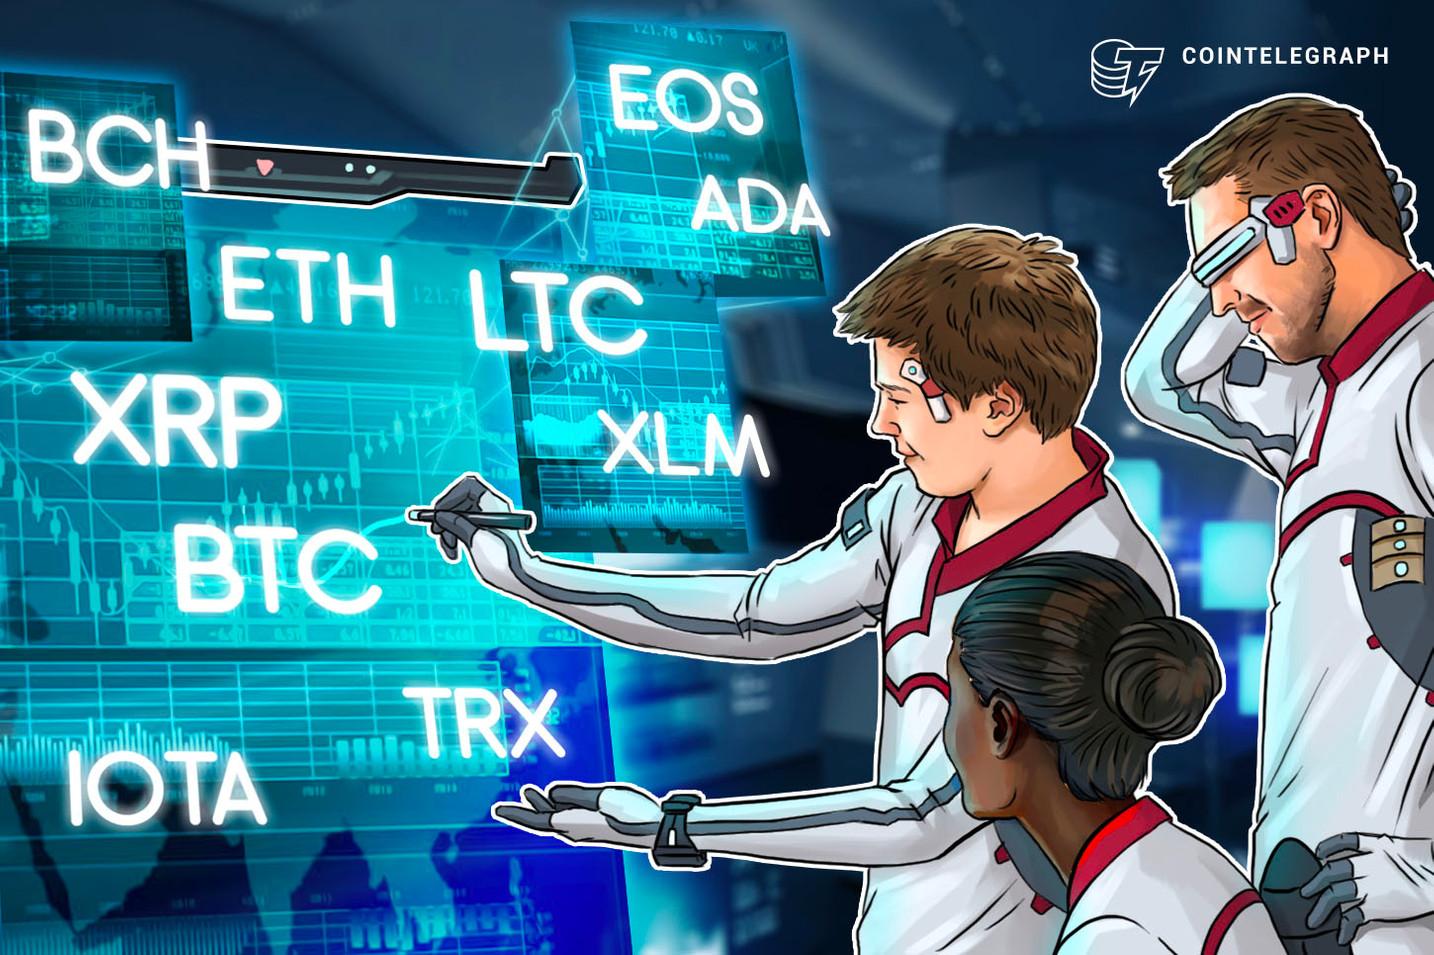 Bitcoin, Ethereum, Ripple, Bitcoin Cash, EOS, Litecoin, Cardano, Stellar, IOTA, TRON: Price Analysis, July 23